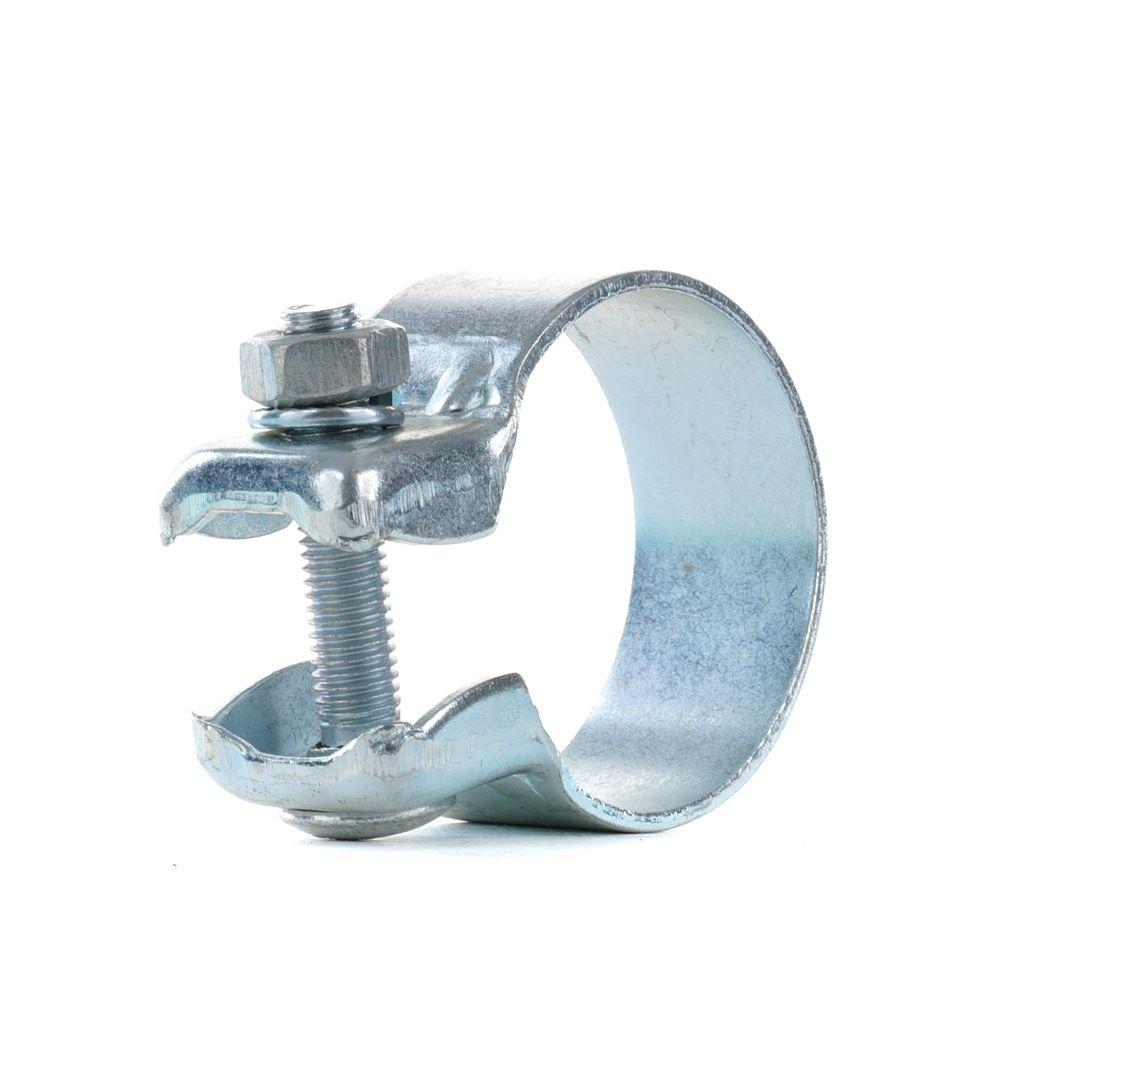 Rohrverbinder, Abgasanlage FA1 951-959 Bewertung